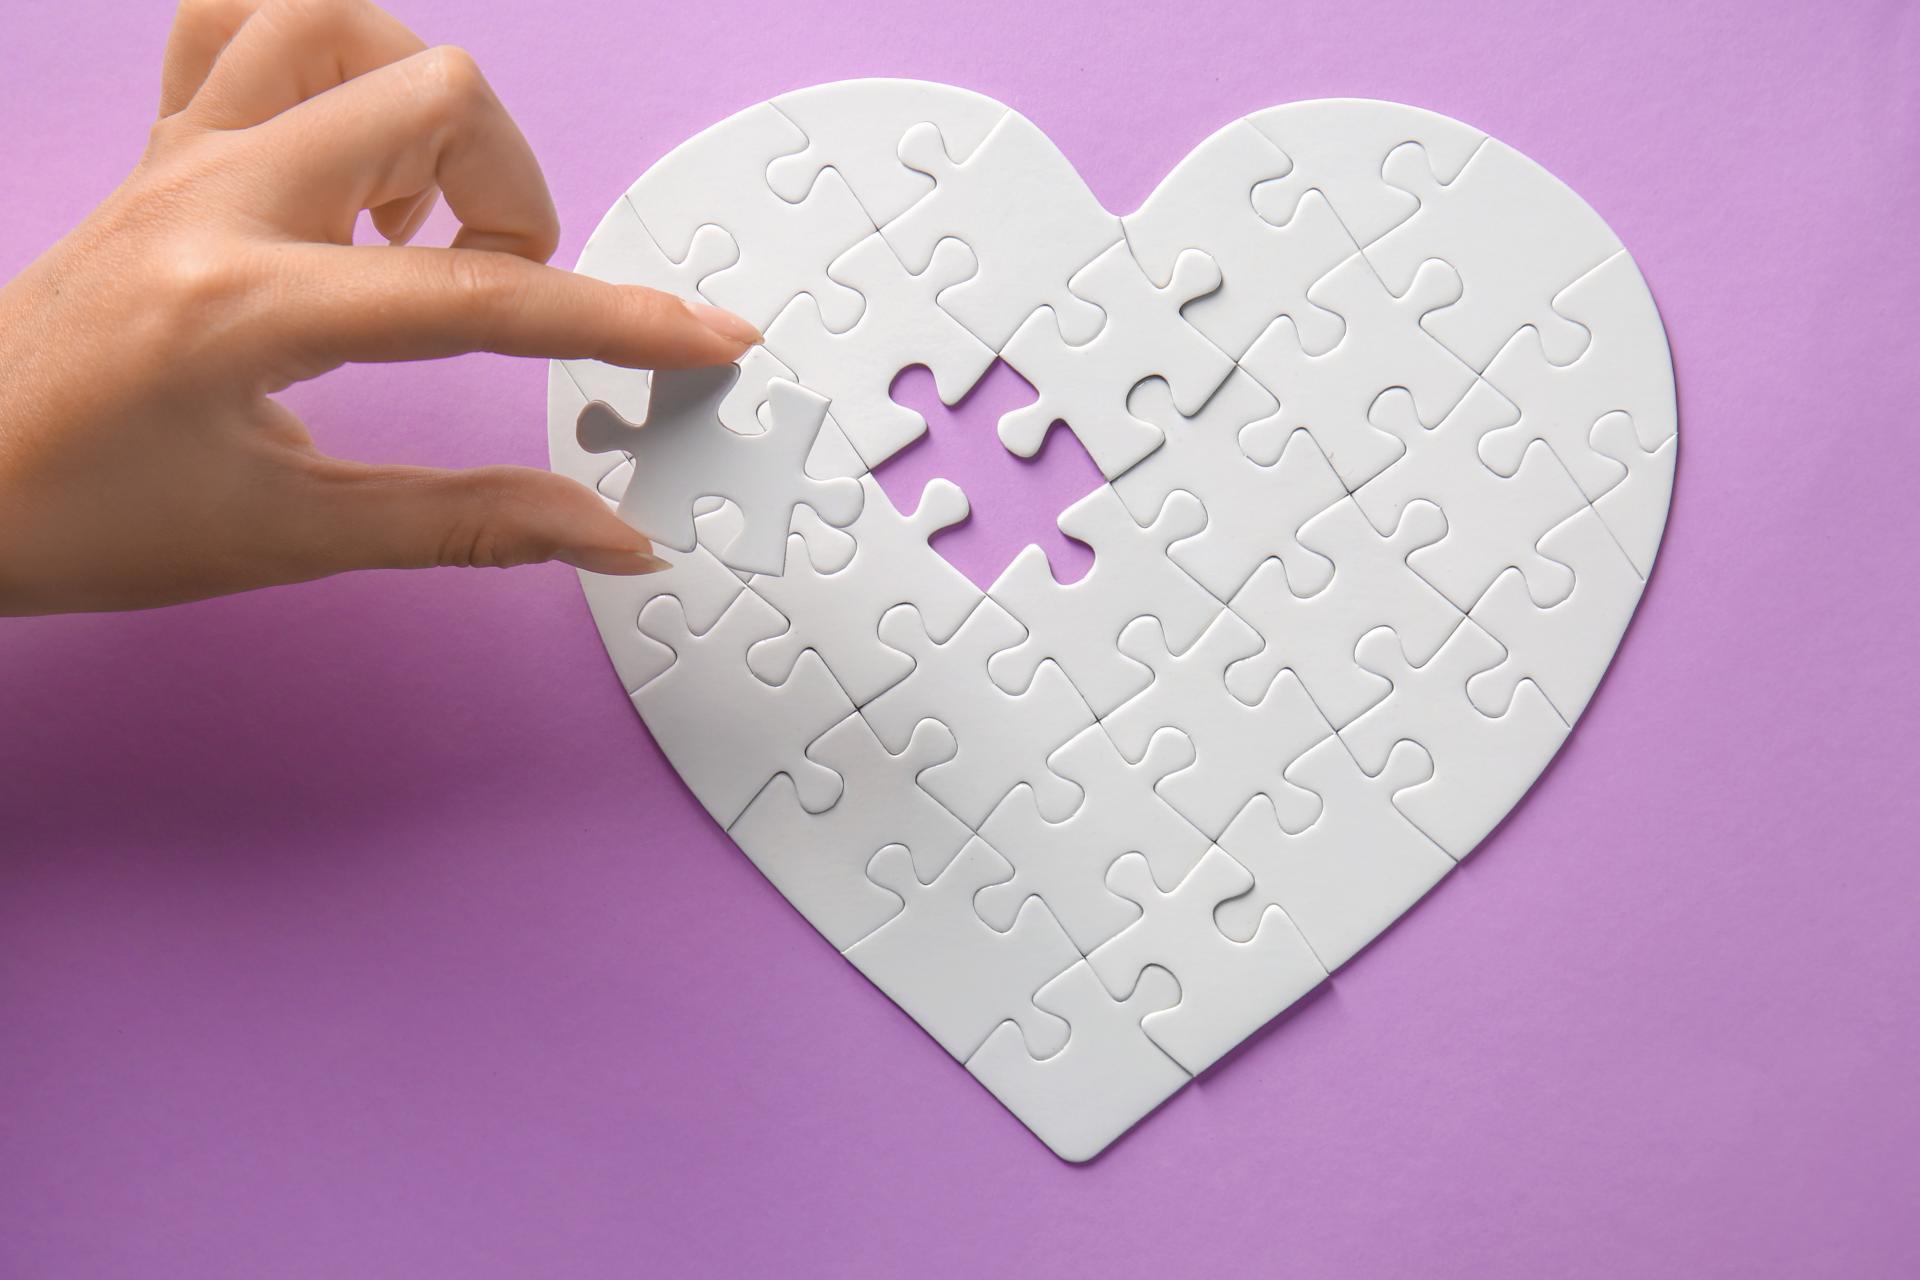 Consensual Non-Monogamy: Is it Right for You? SDC.com